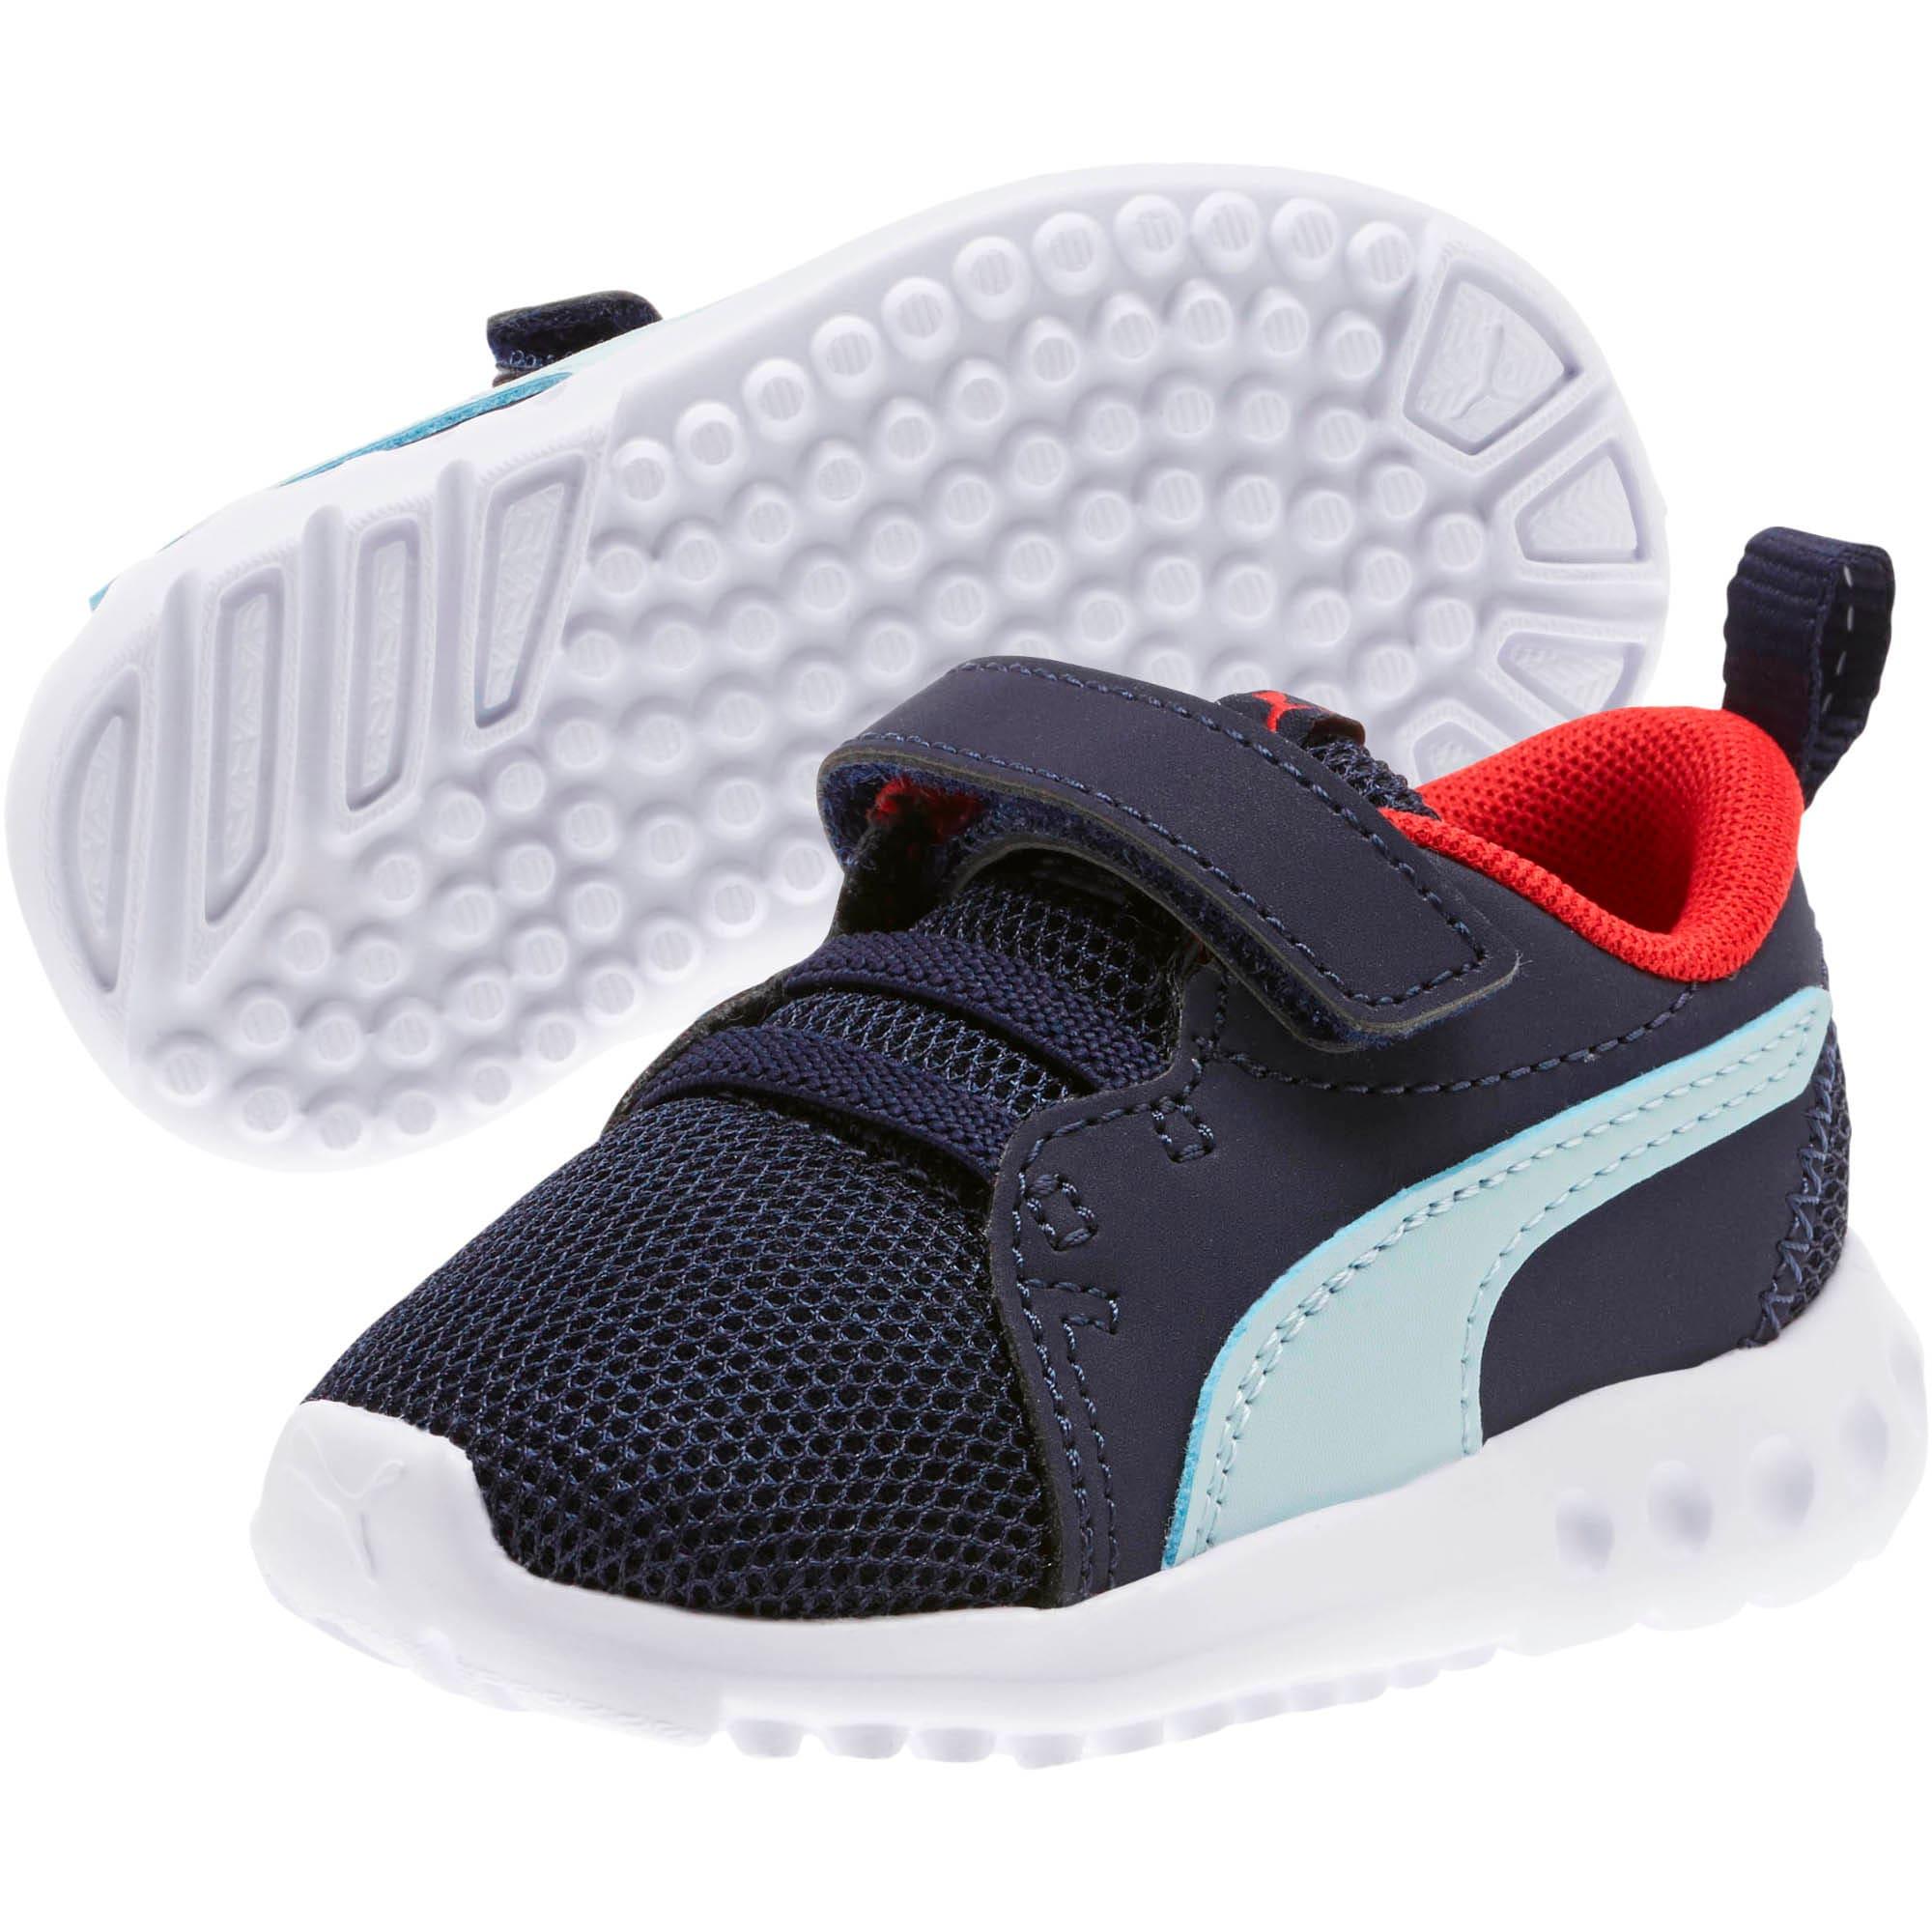 Miniatura 2 de Zapatos Carson2 Casual para bebés, Peacoat-Light Sky-Red, mediano